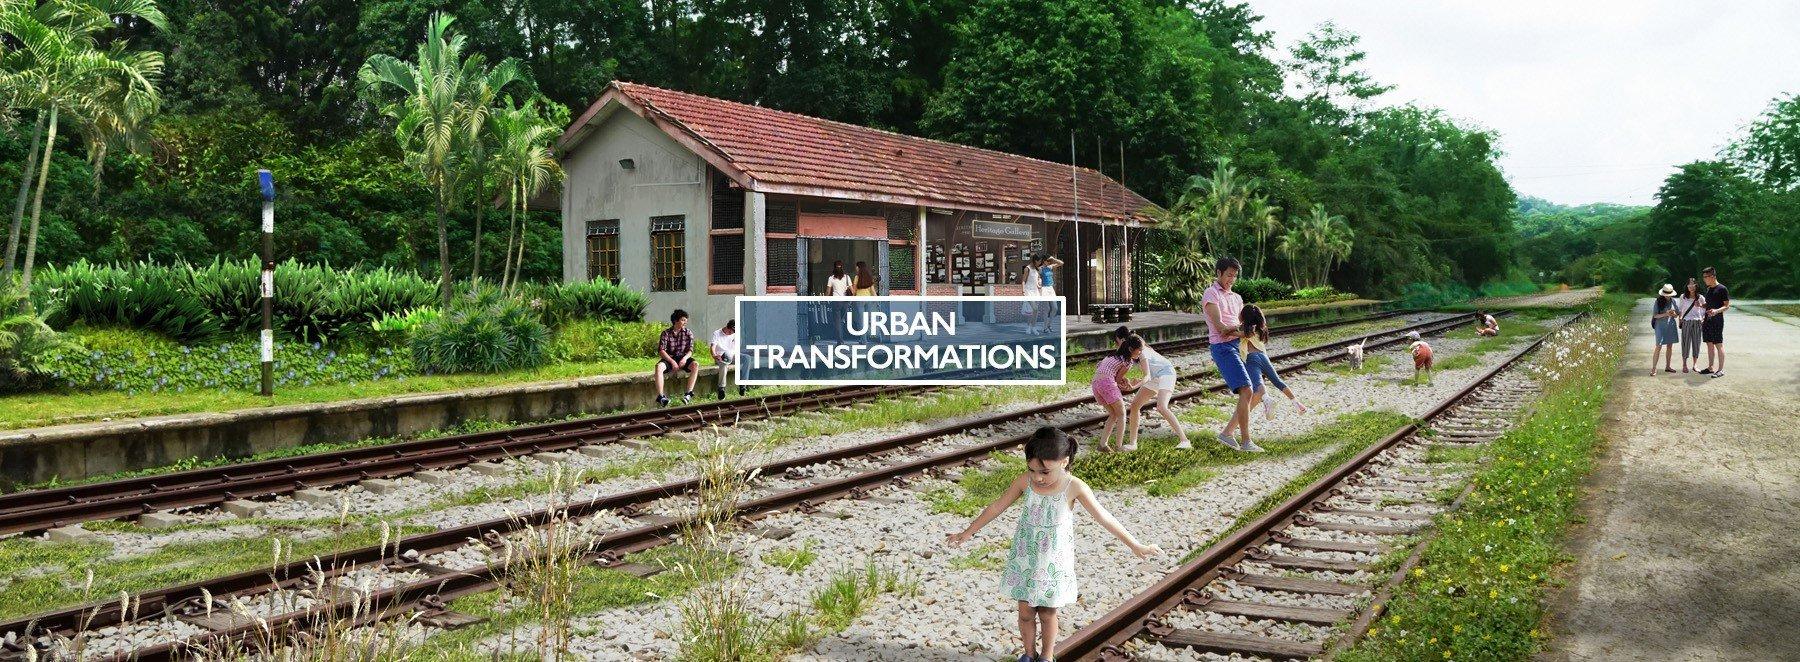 URA Master Plan - Rail Corridor